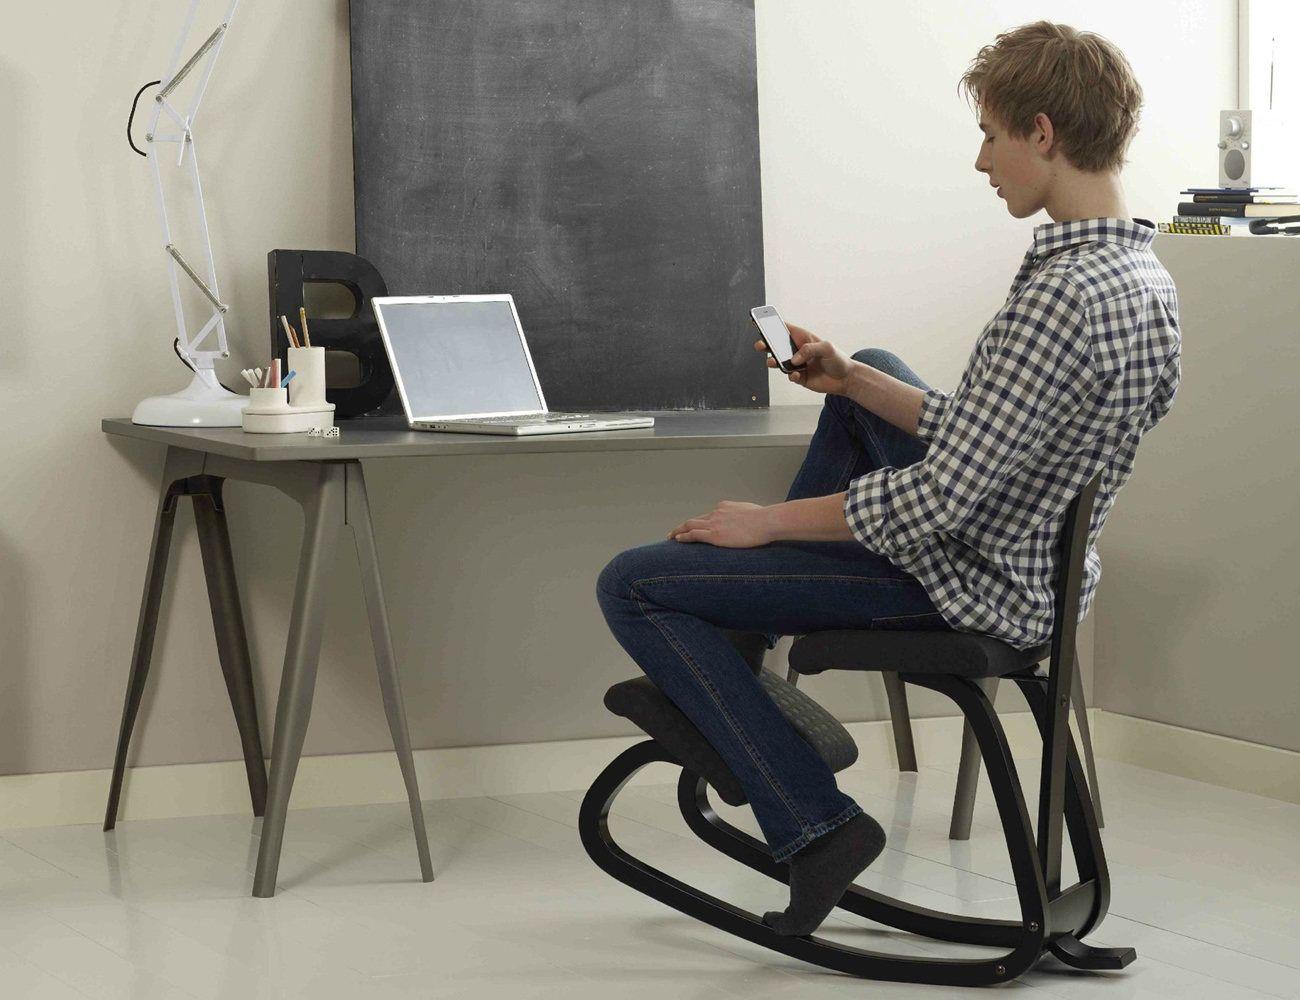 The Benefits of an Ergonomic Chair | Ergonomic chair ...